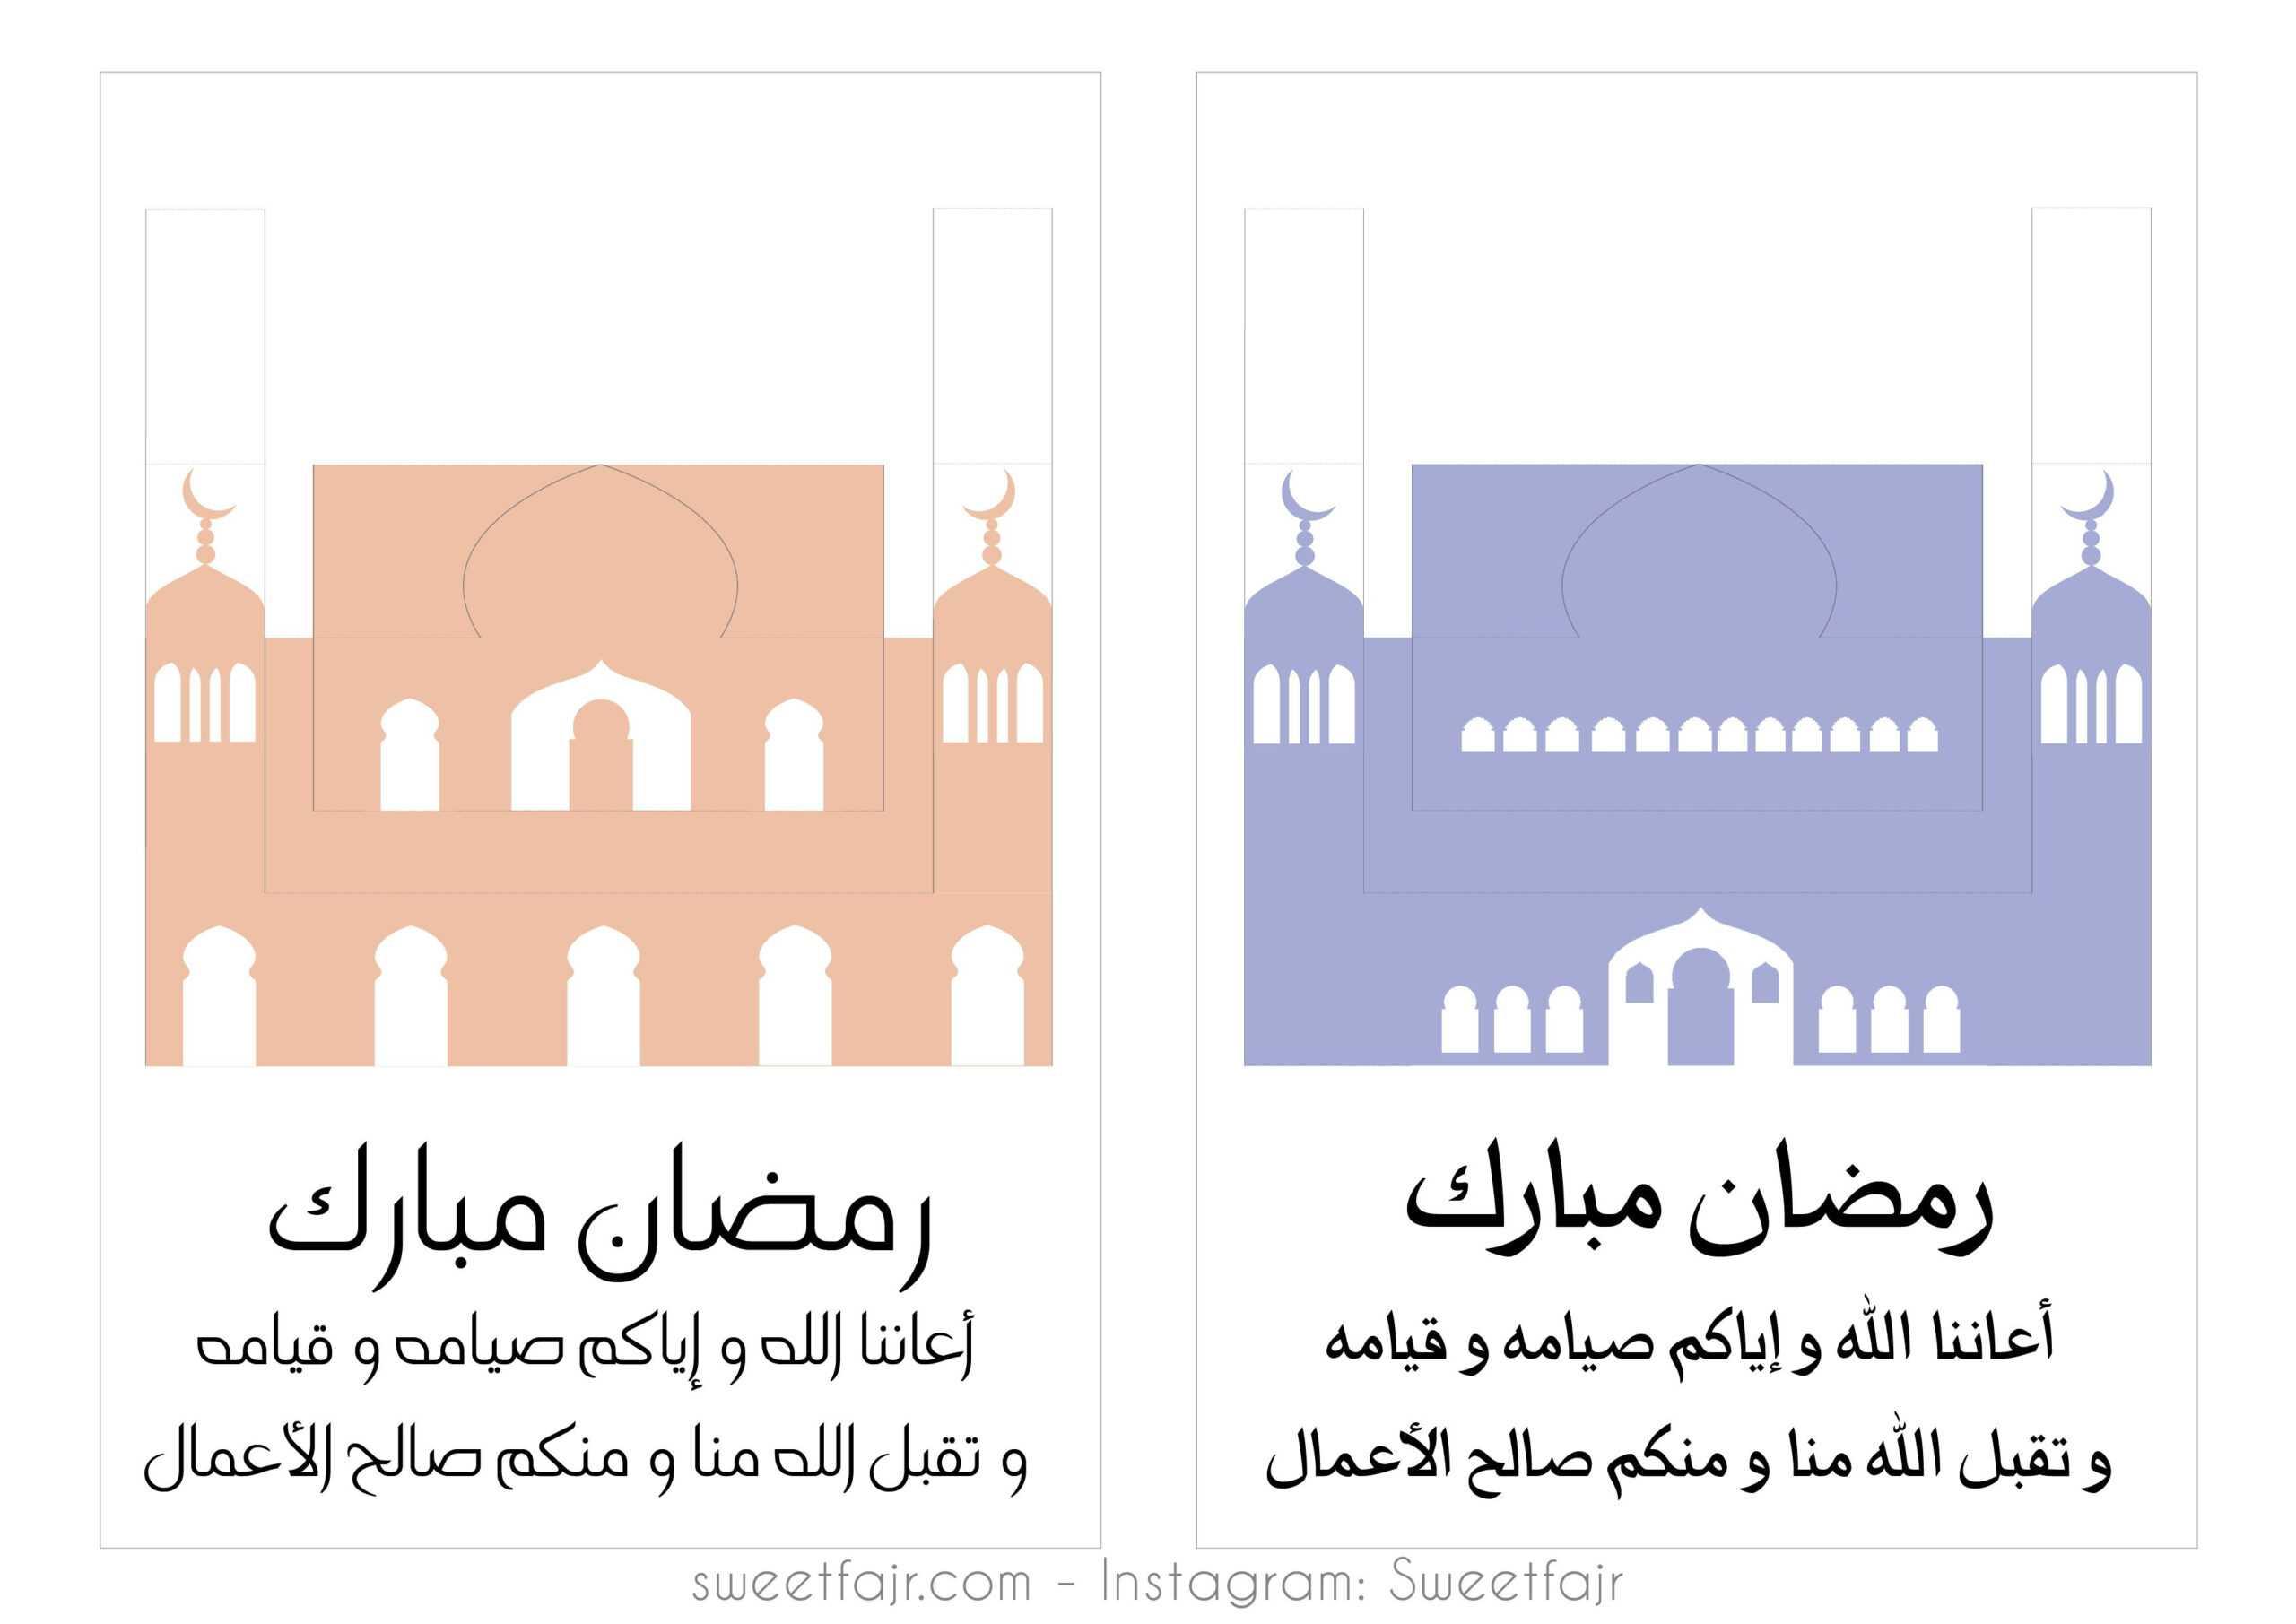 Pop Up Card Templates For Ramadan | Free Printable Pop-Up in Pop Up Card Templates Free Printable